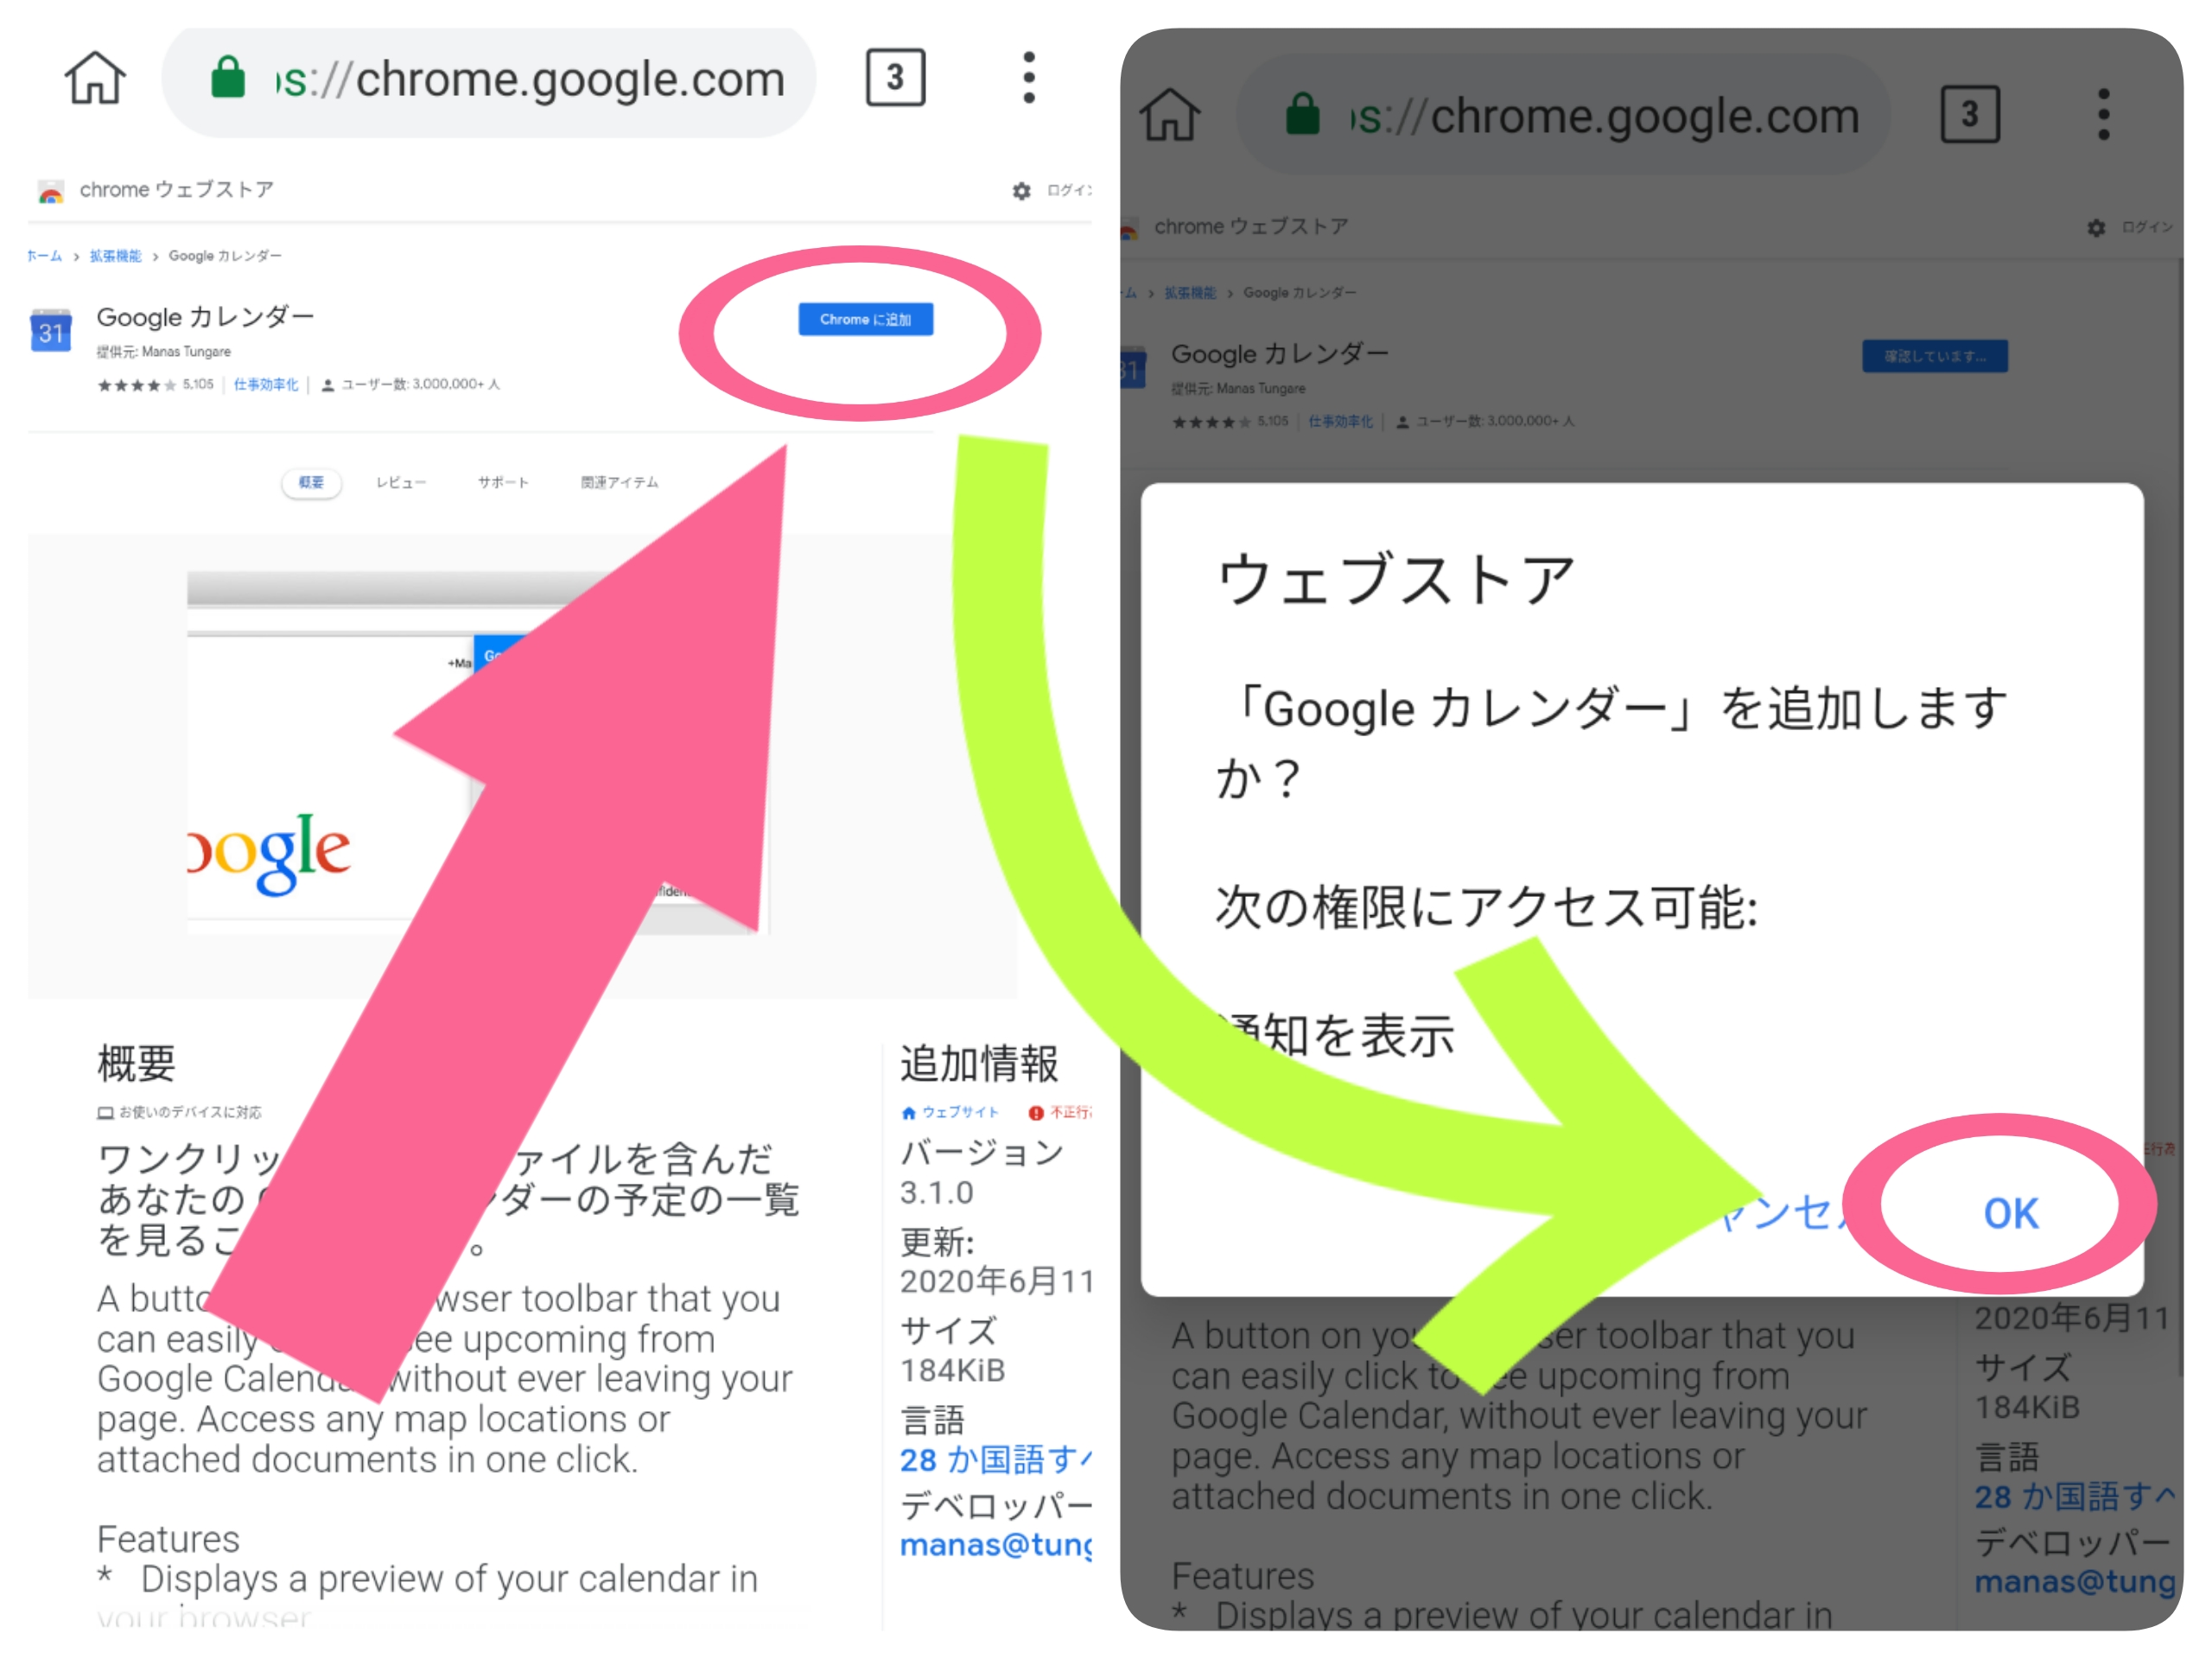 Kiwi Browser Chrome ウェブストア 拡張機能 Chromeに追加 タップ 確認画面 OK 追加 完了